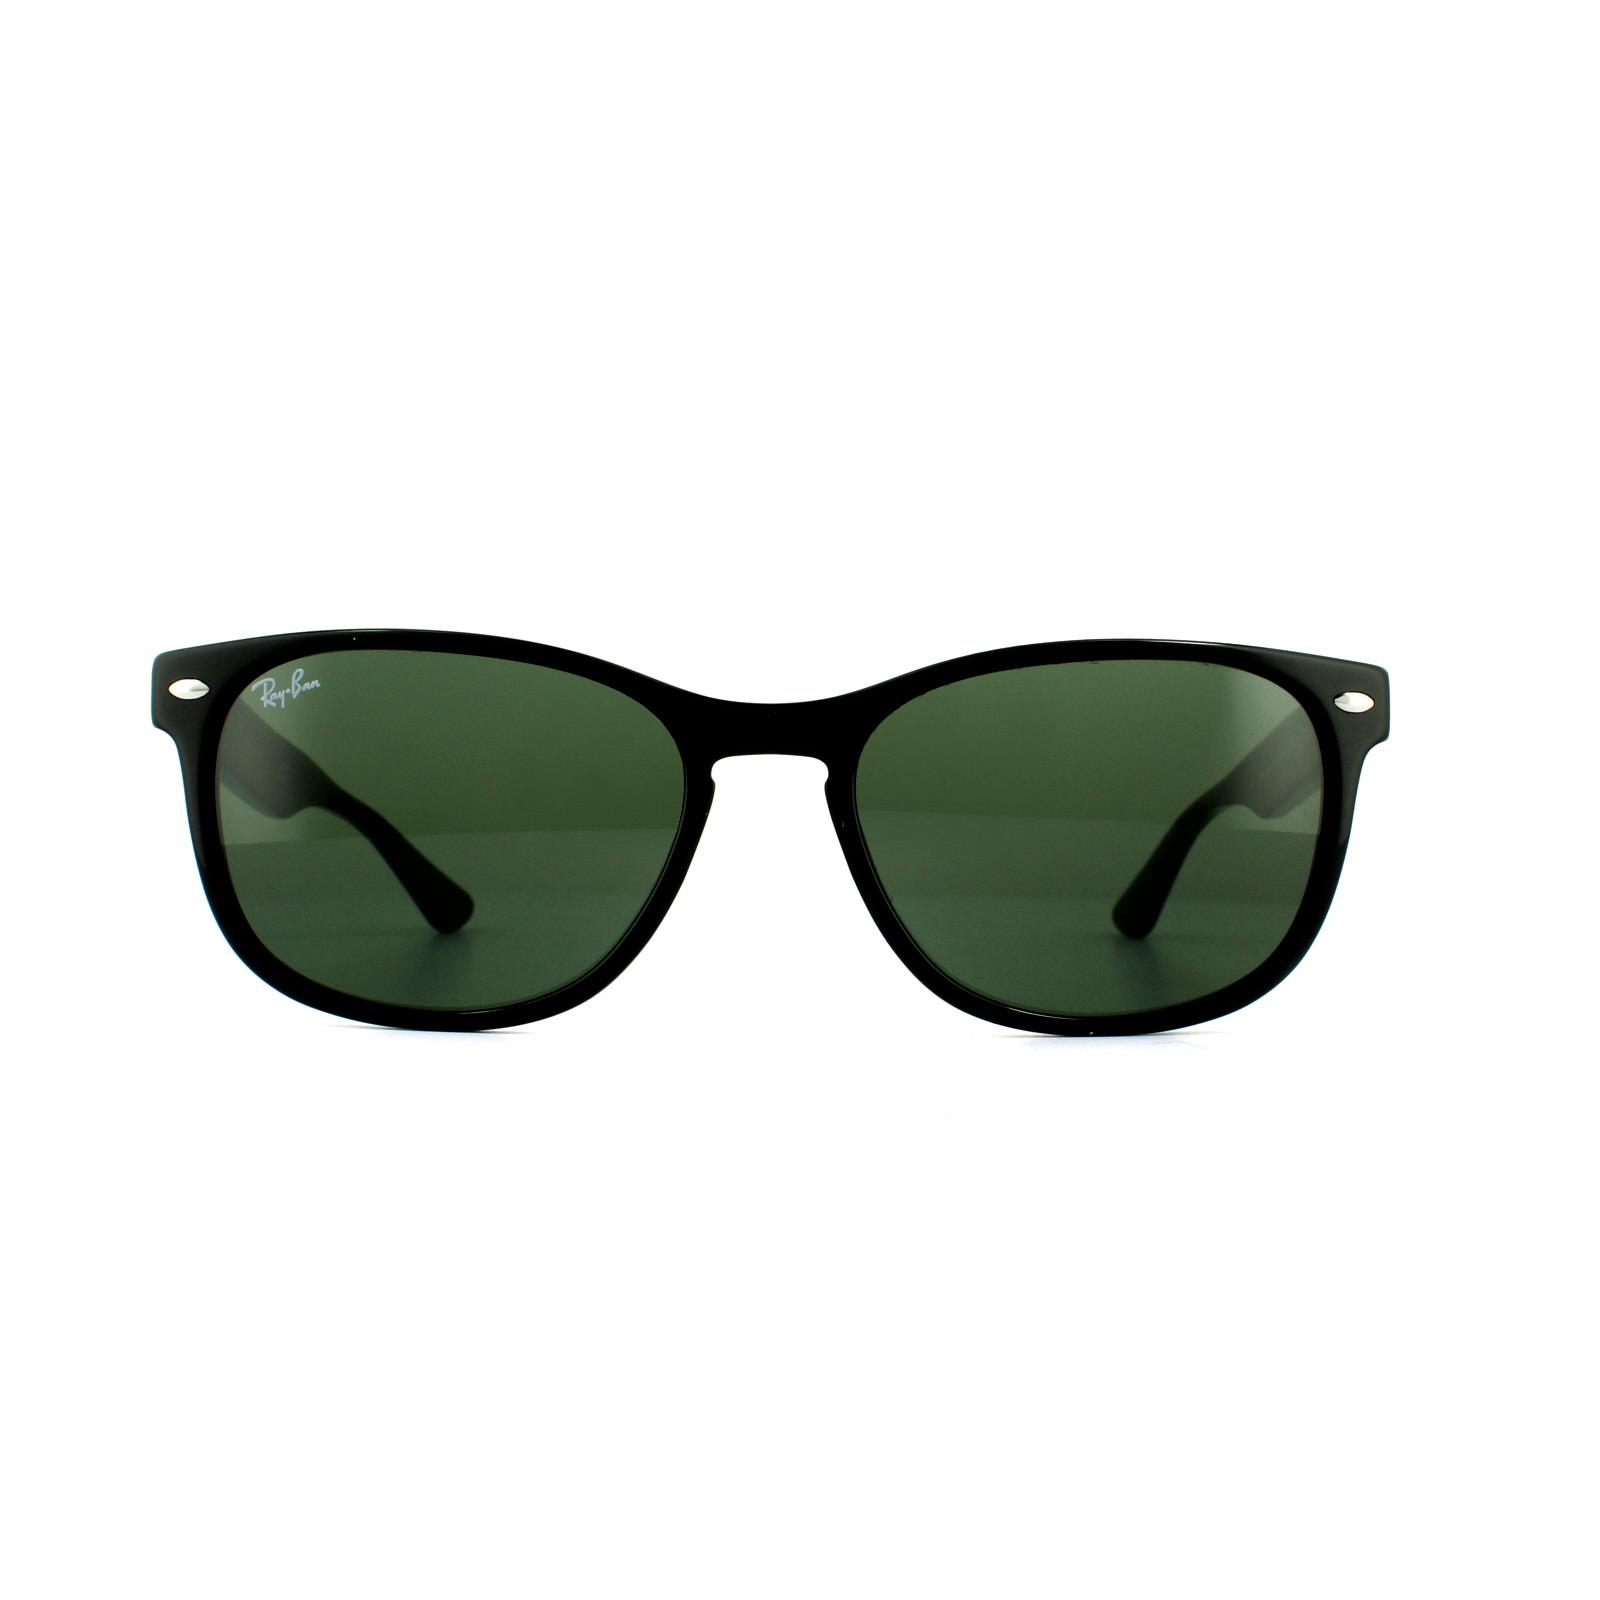 c60cad96767 Ray-Ban Sunglasses RB2184 901 31 Black Green 8053672970890